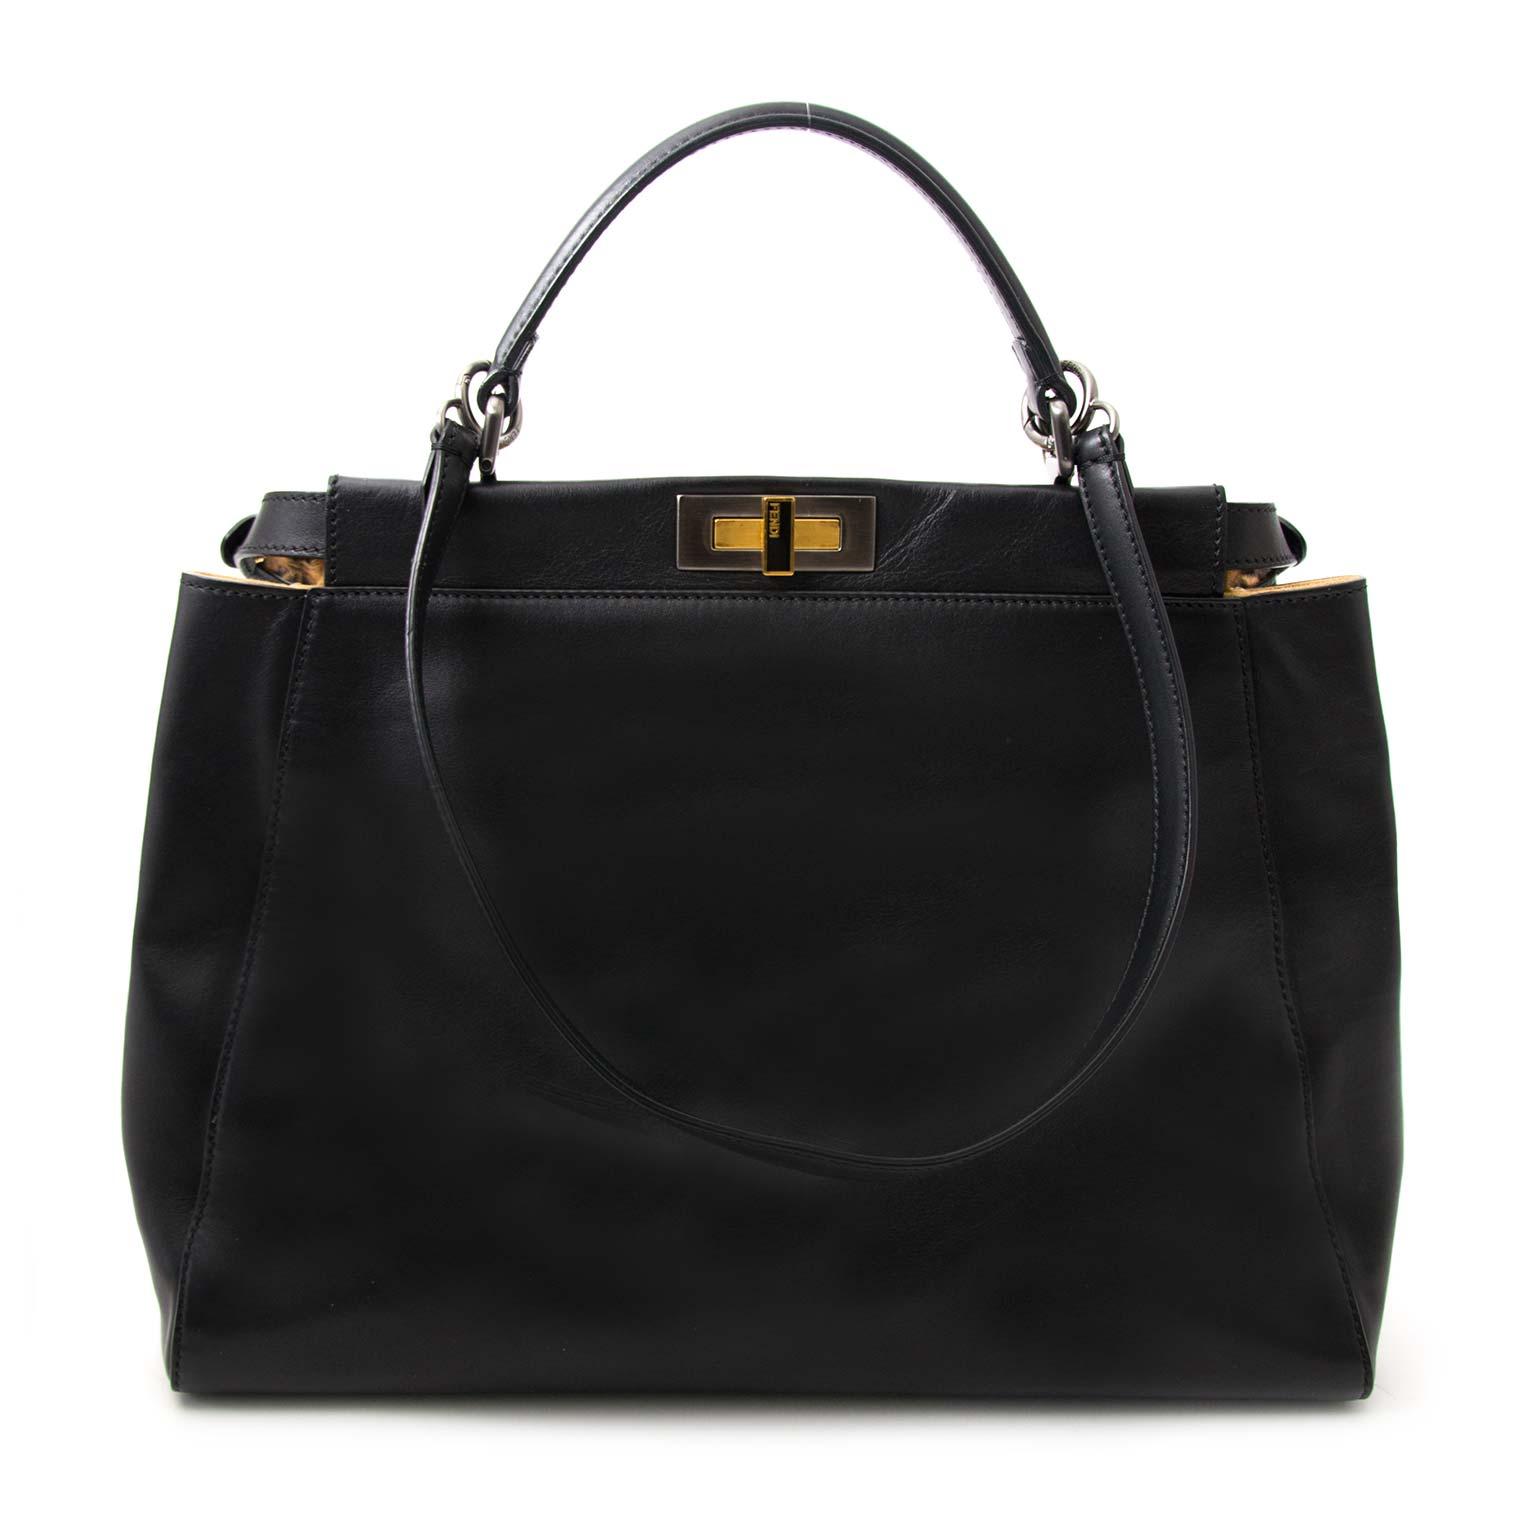 skip the waitinglist 100% authenetic as new Fendi Black Leopard-Lined Peekaboo Large Bag